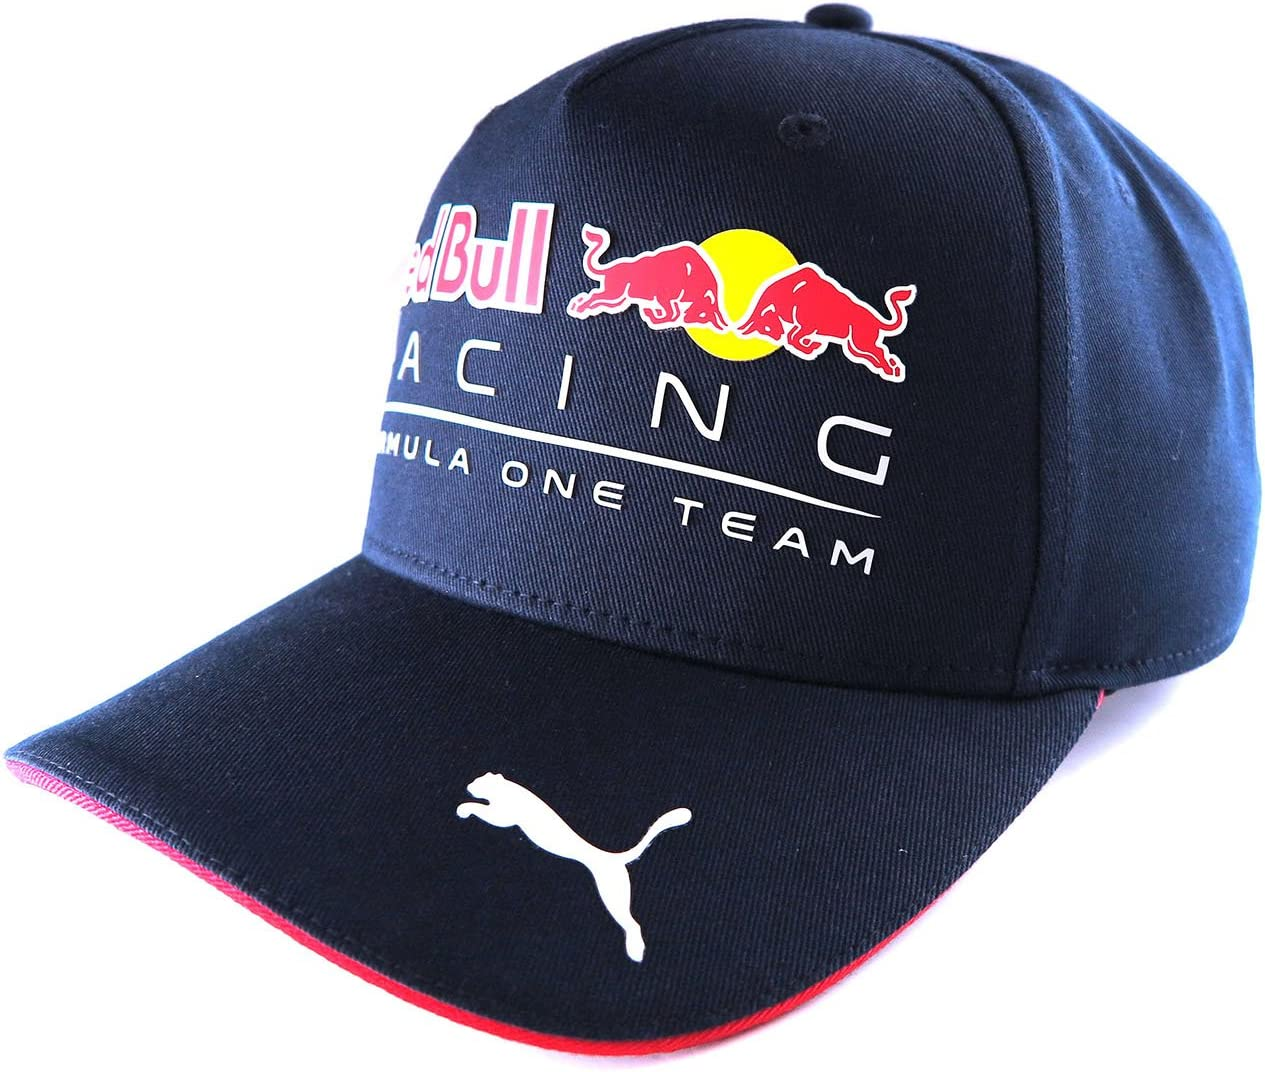 Red Bull Racing Formula One Team Nuevo. 2017 Gorra de Adulto Puma ...